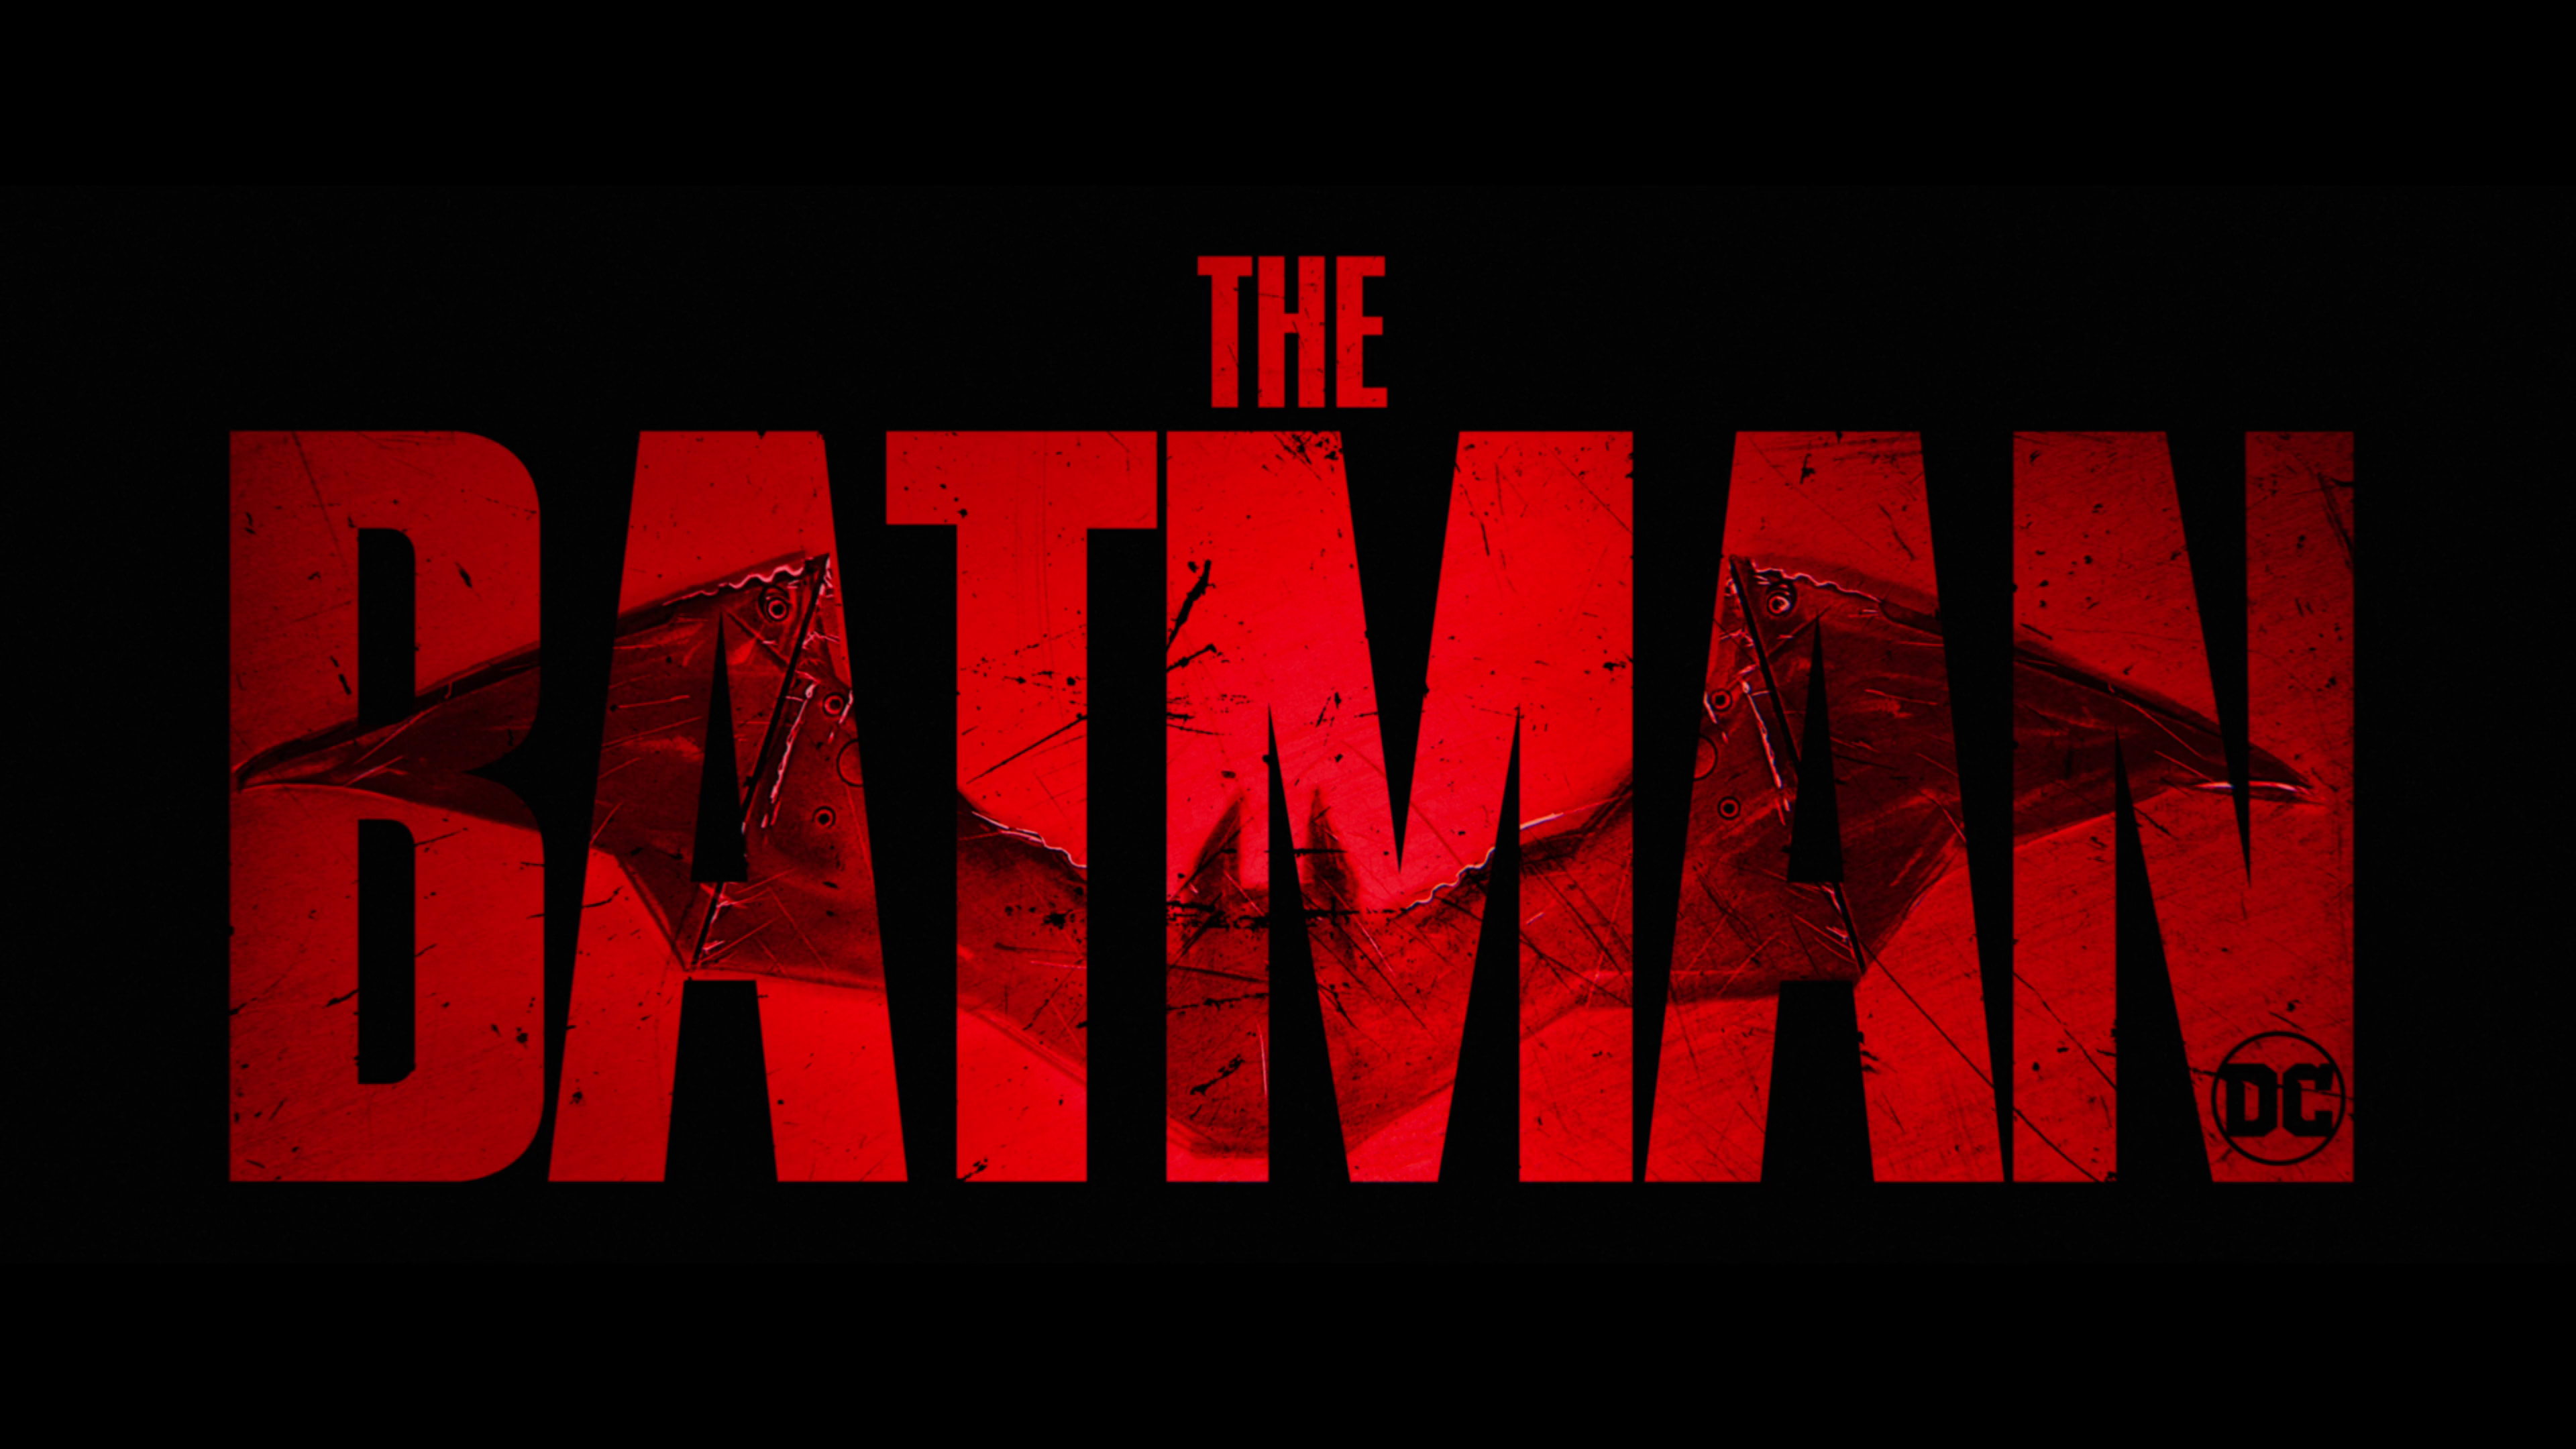 The Batman 2021 Title Card [3840x2160] wallpapers 3840x2160